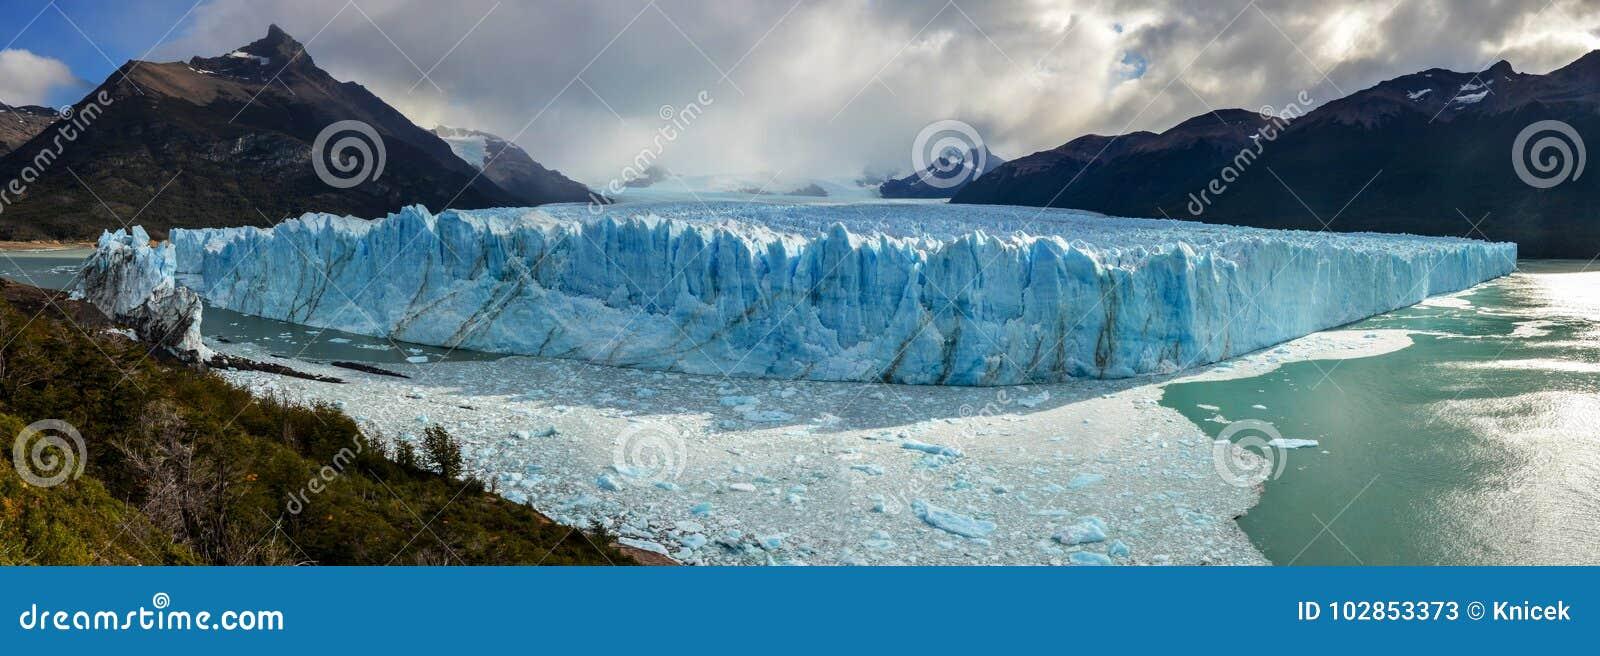 Ледник Perito Moreno в национальном парке Лос Glaciares в El Calafate, Аргентине, Южной Америке